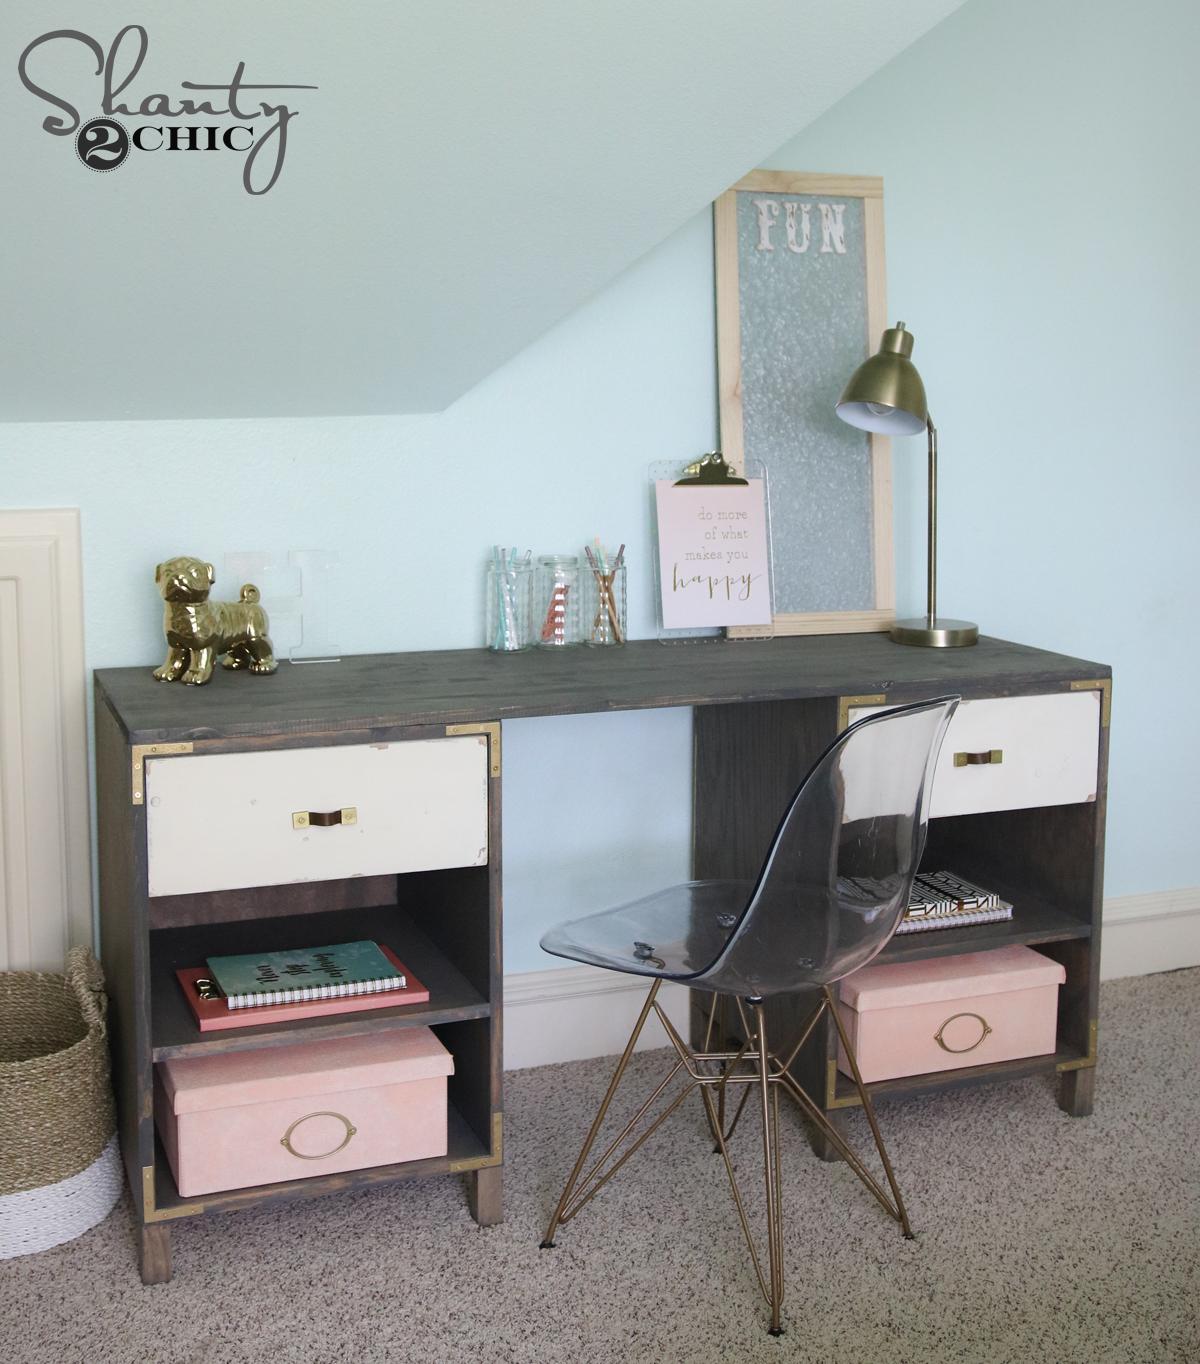 Cubby Storage Desk DIY